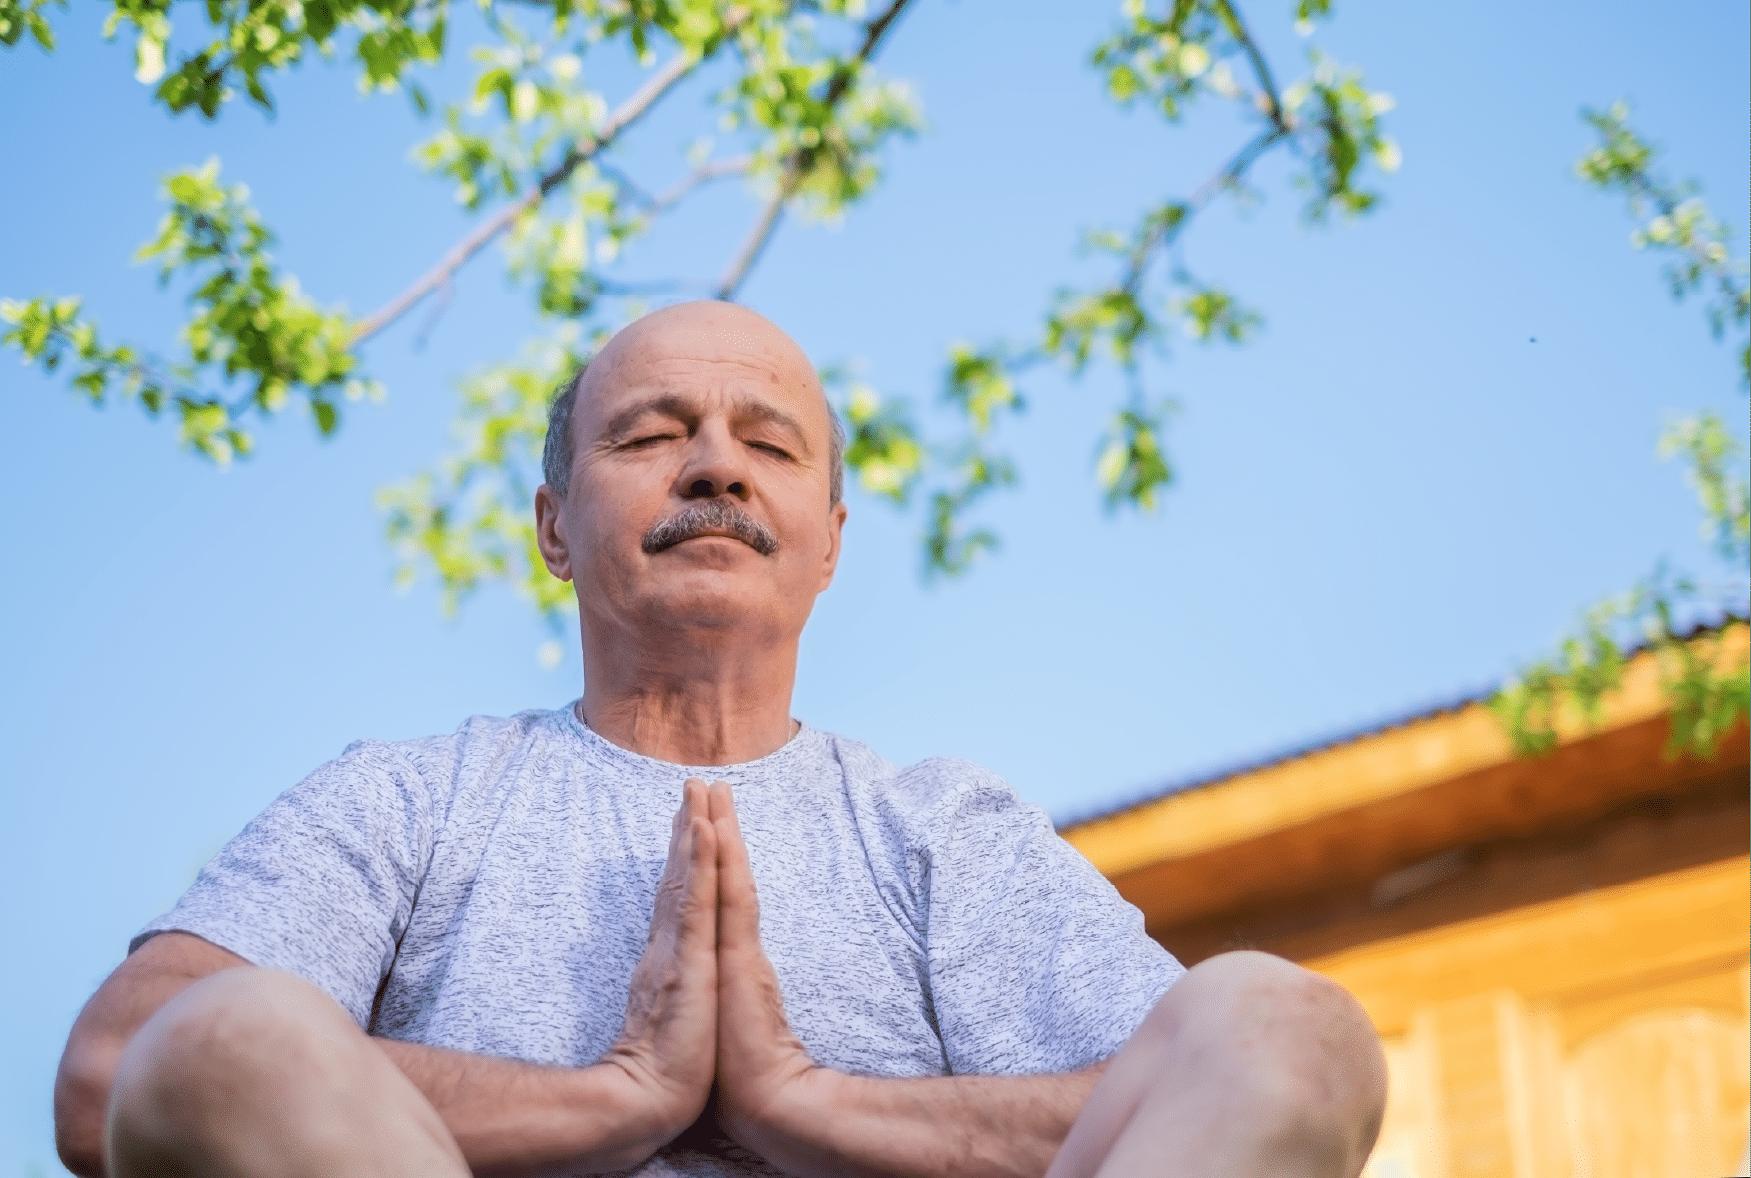 An older gentleman meditating